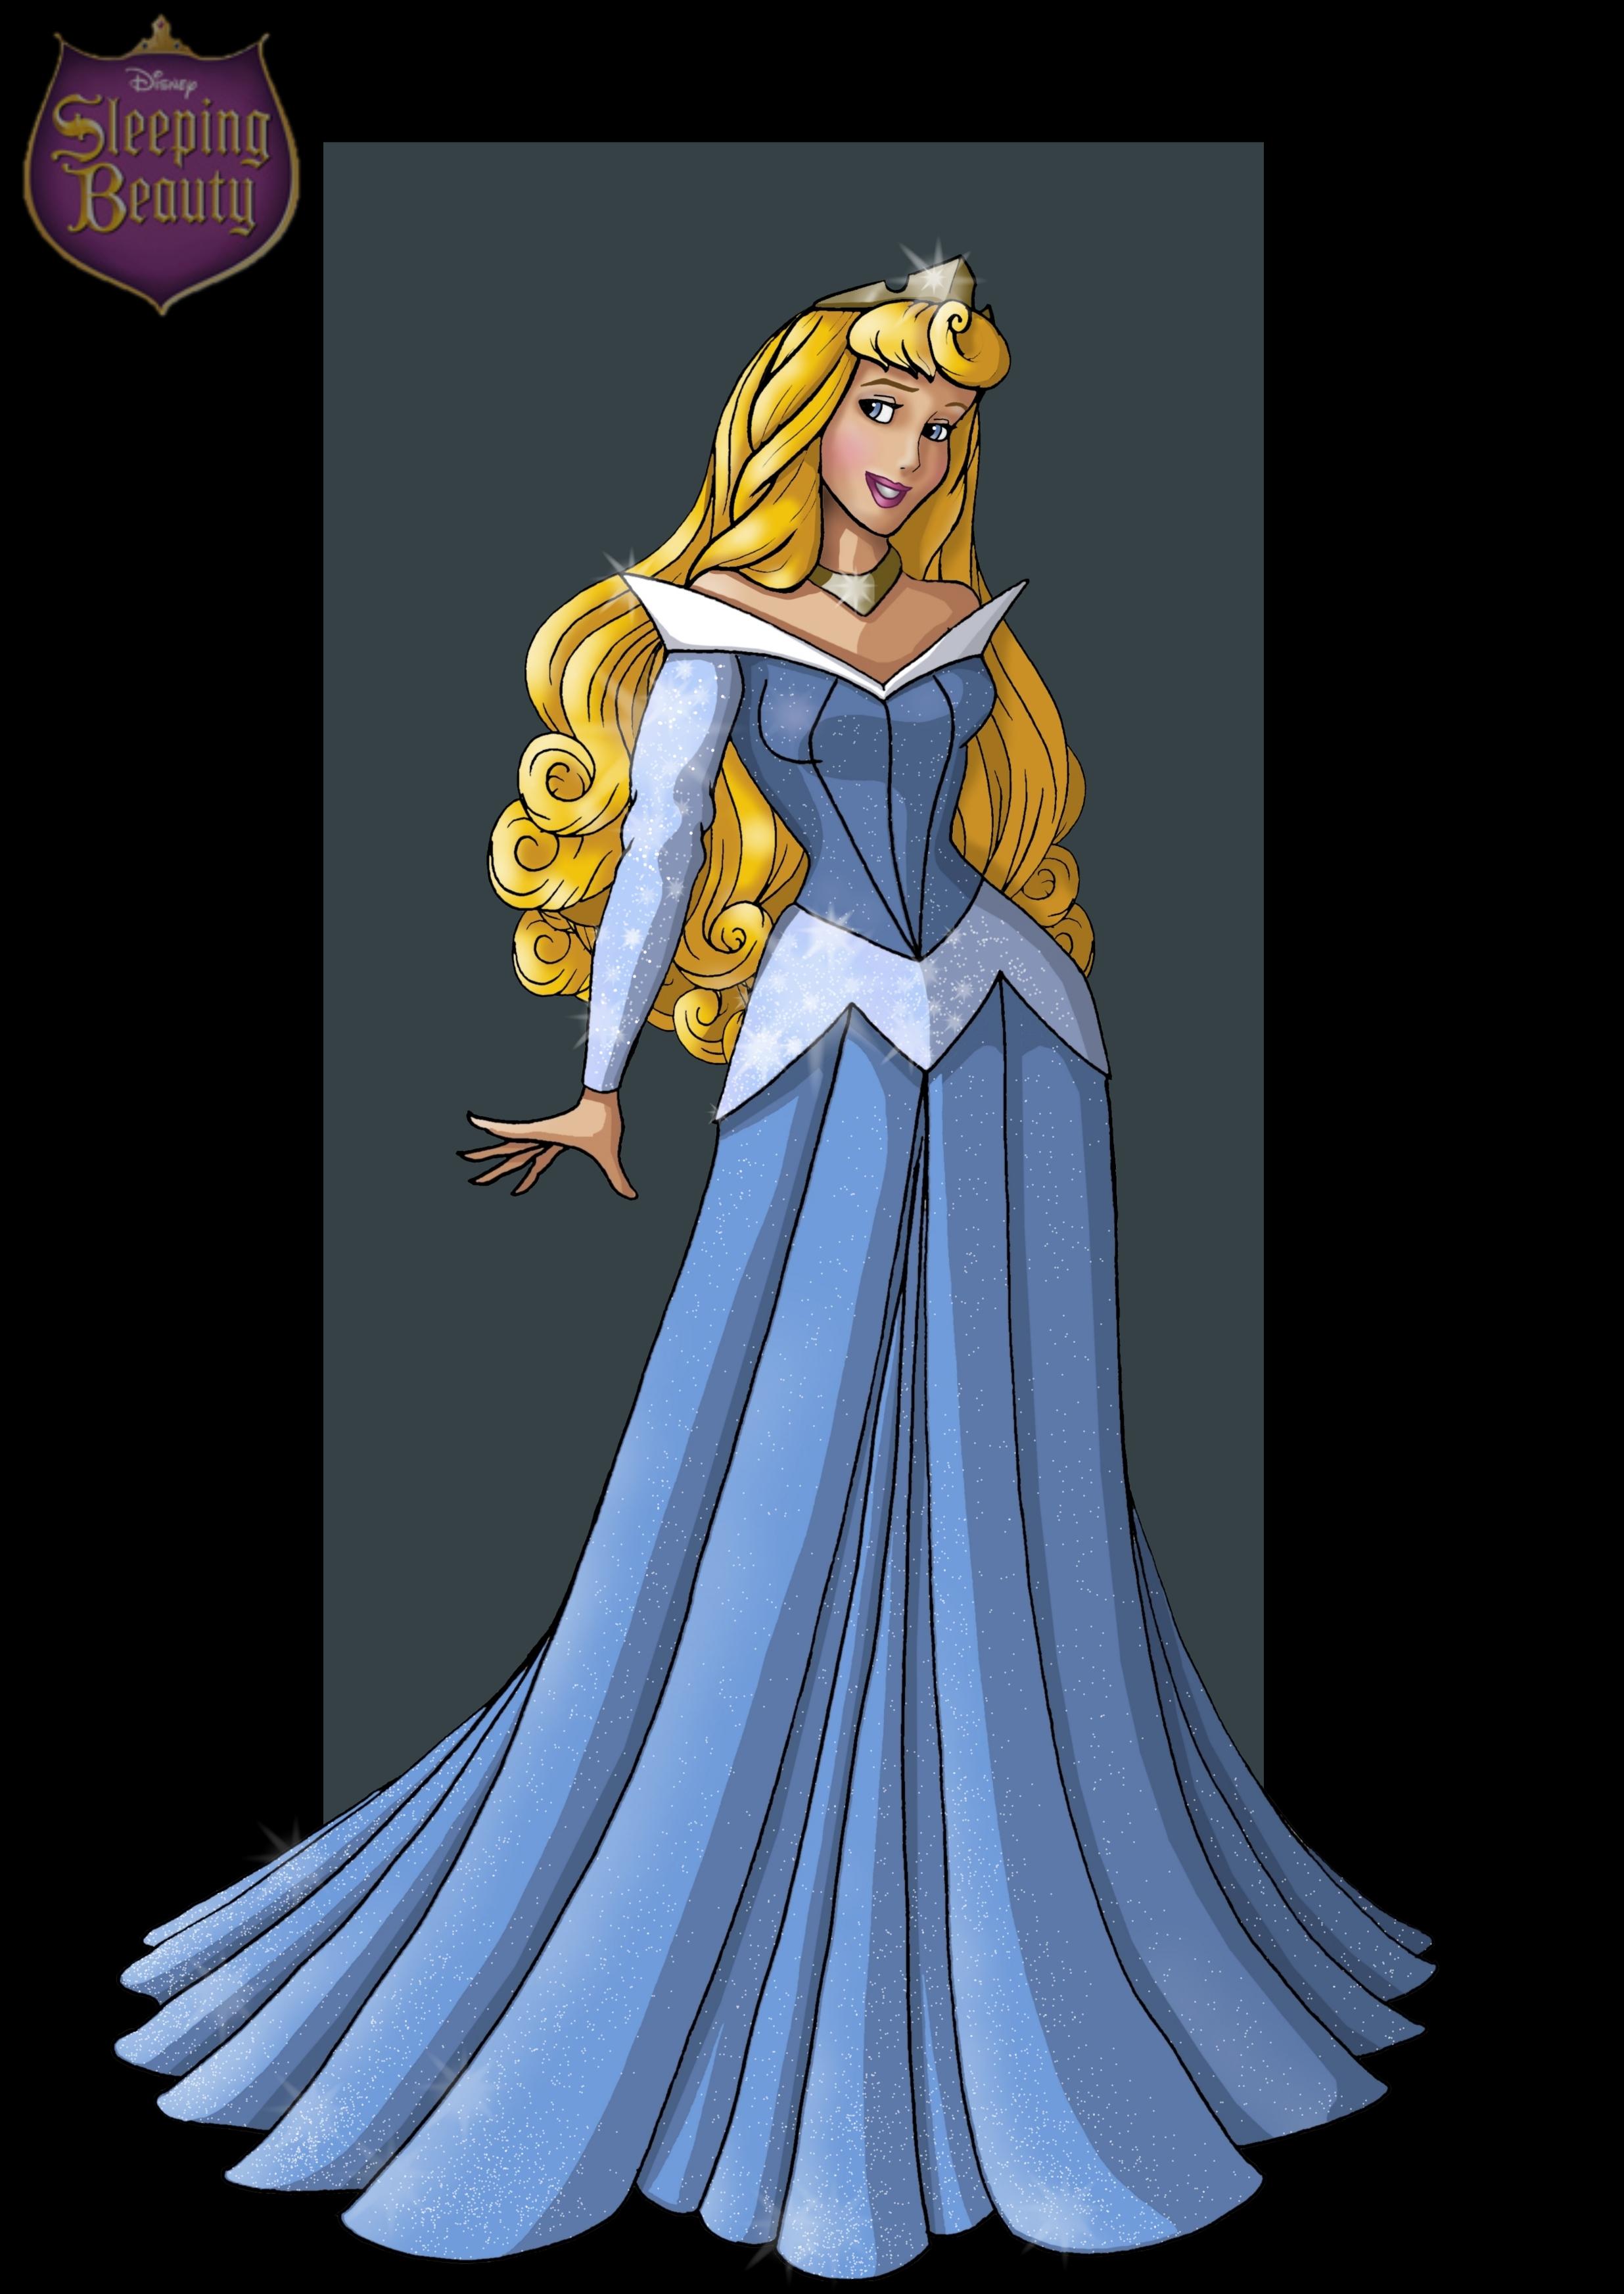 Sleeping Beauty Blue Cartoon Widescreen Background Image for 2471x3490